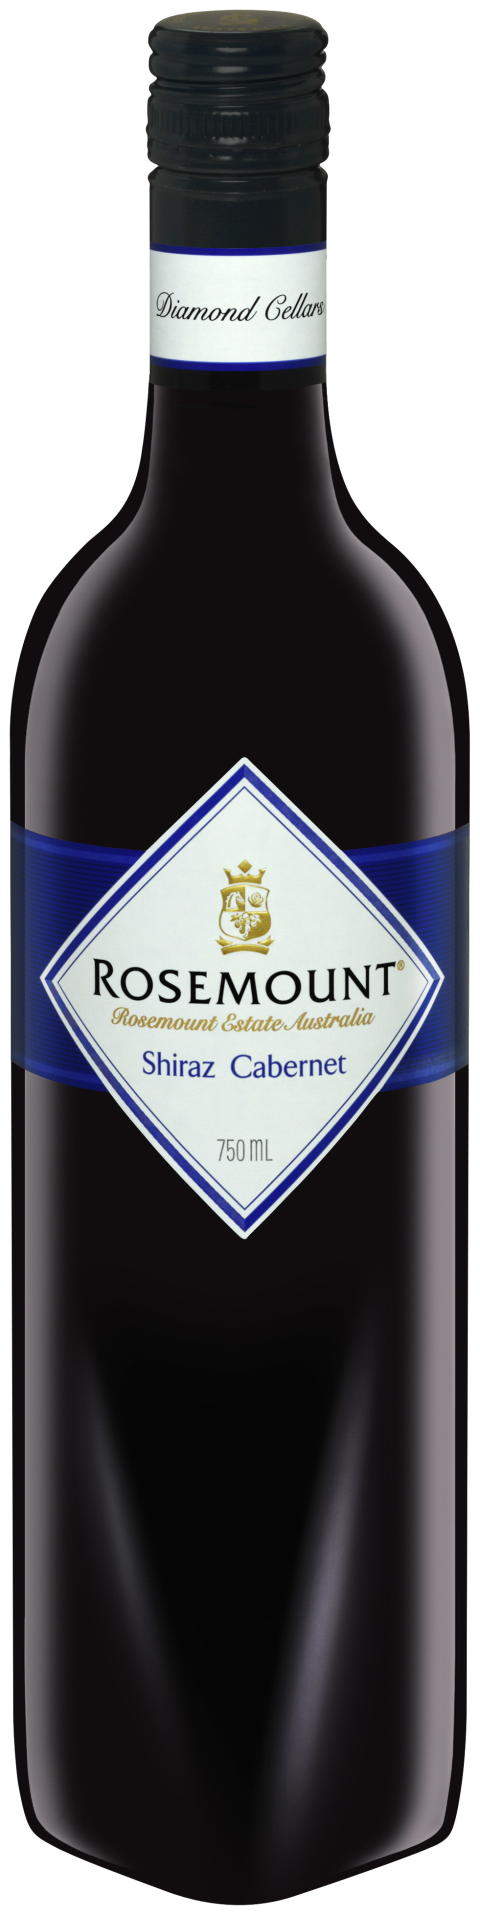 Rosemount Shiraz Cabernet